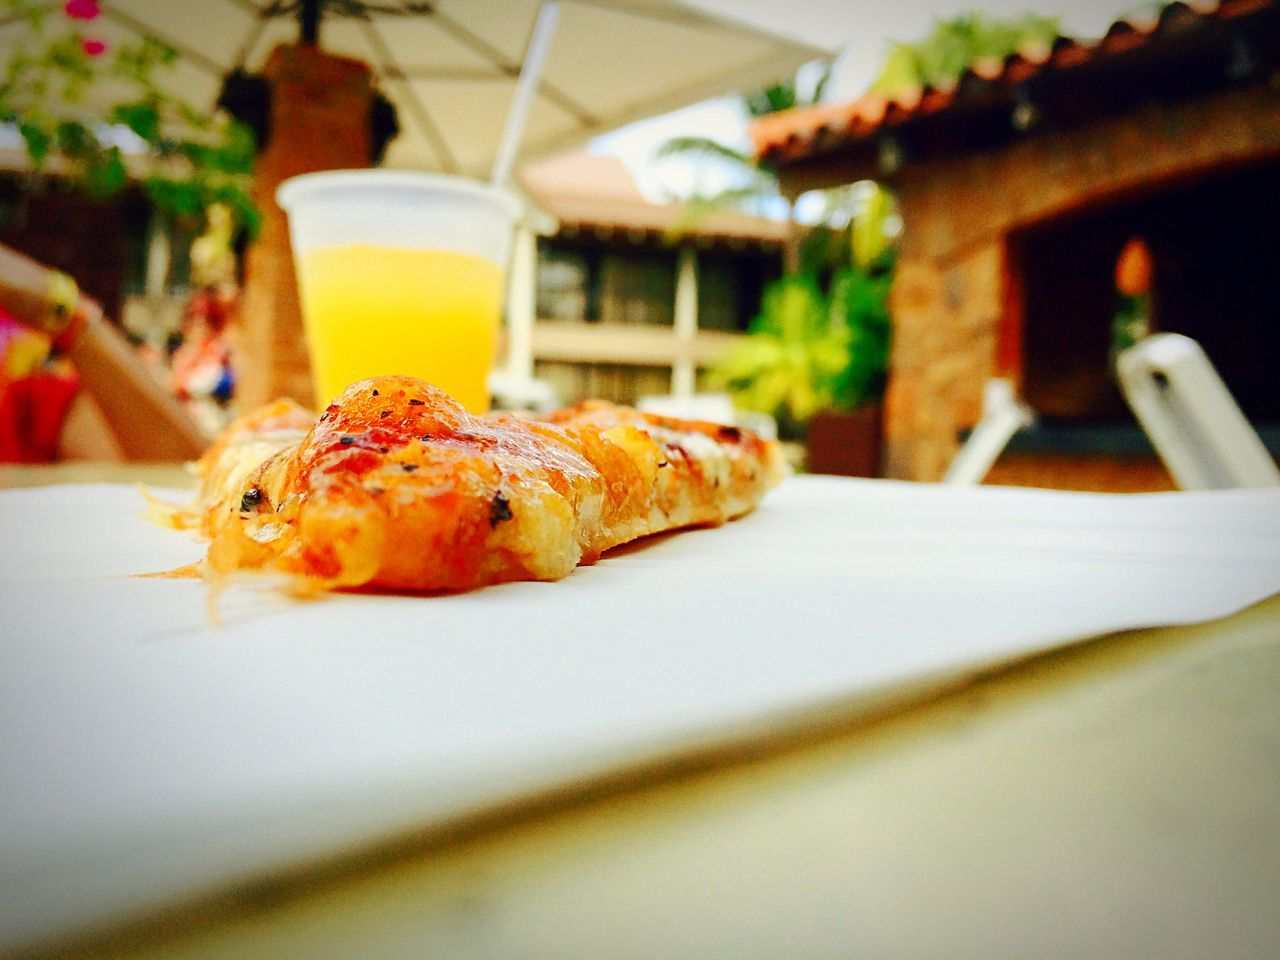 Pizza Snack Bonappetit Orangejuice